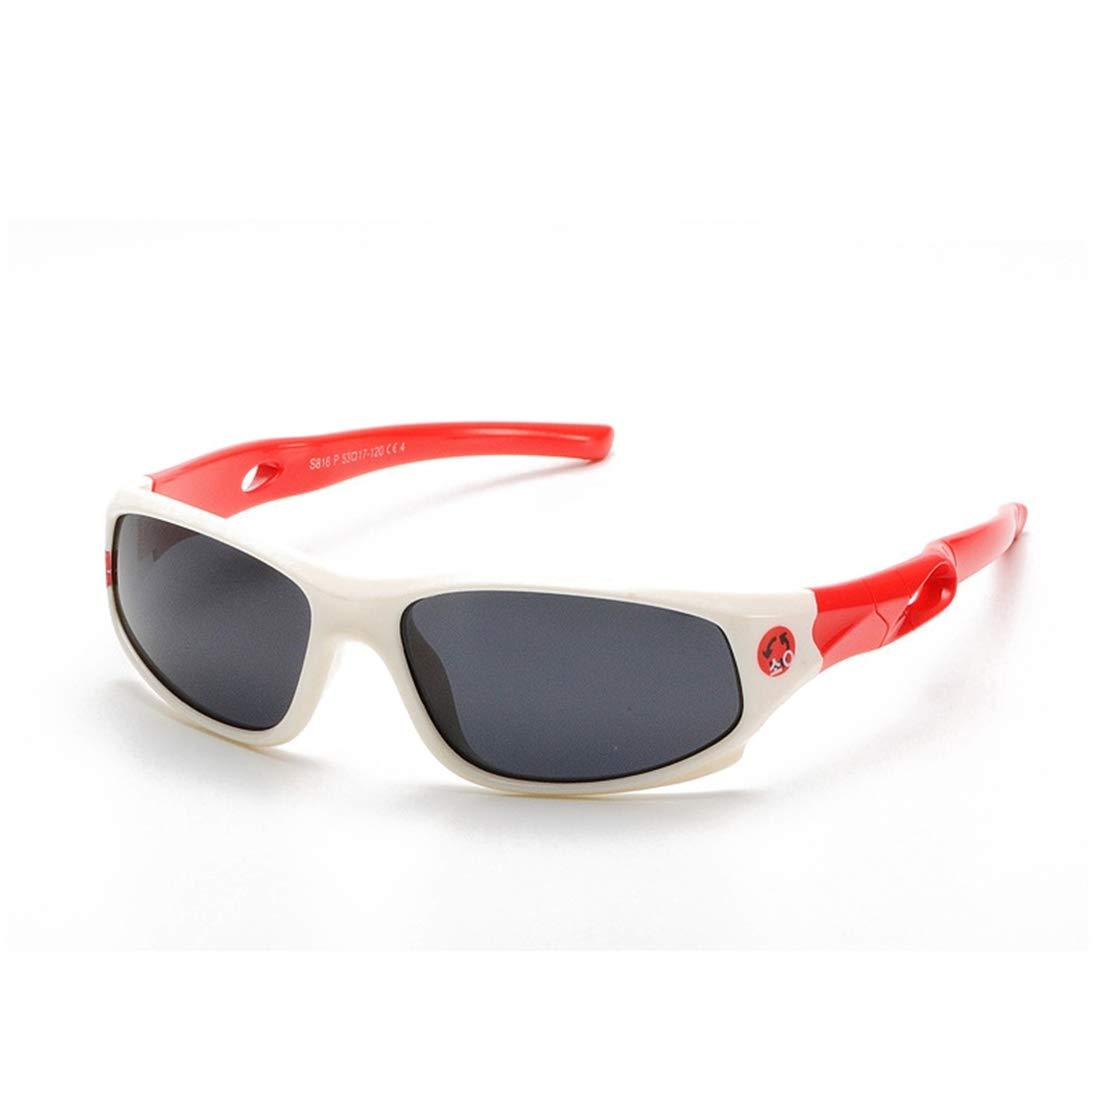 Freahap Childrens Sunglasses Kids Polarized Glasses Antiglare Shade Sports Glasses Bendable Frame